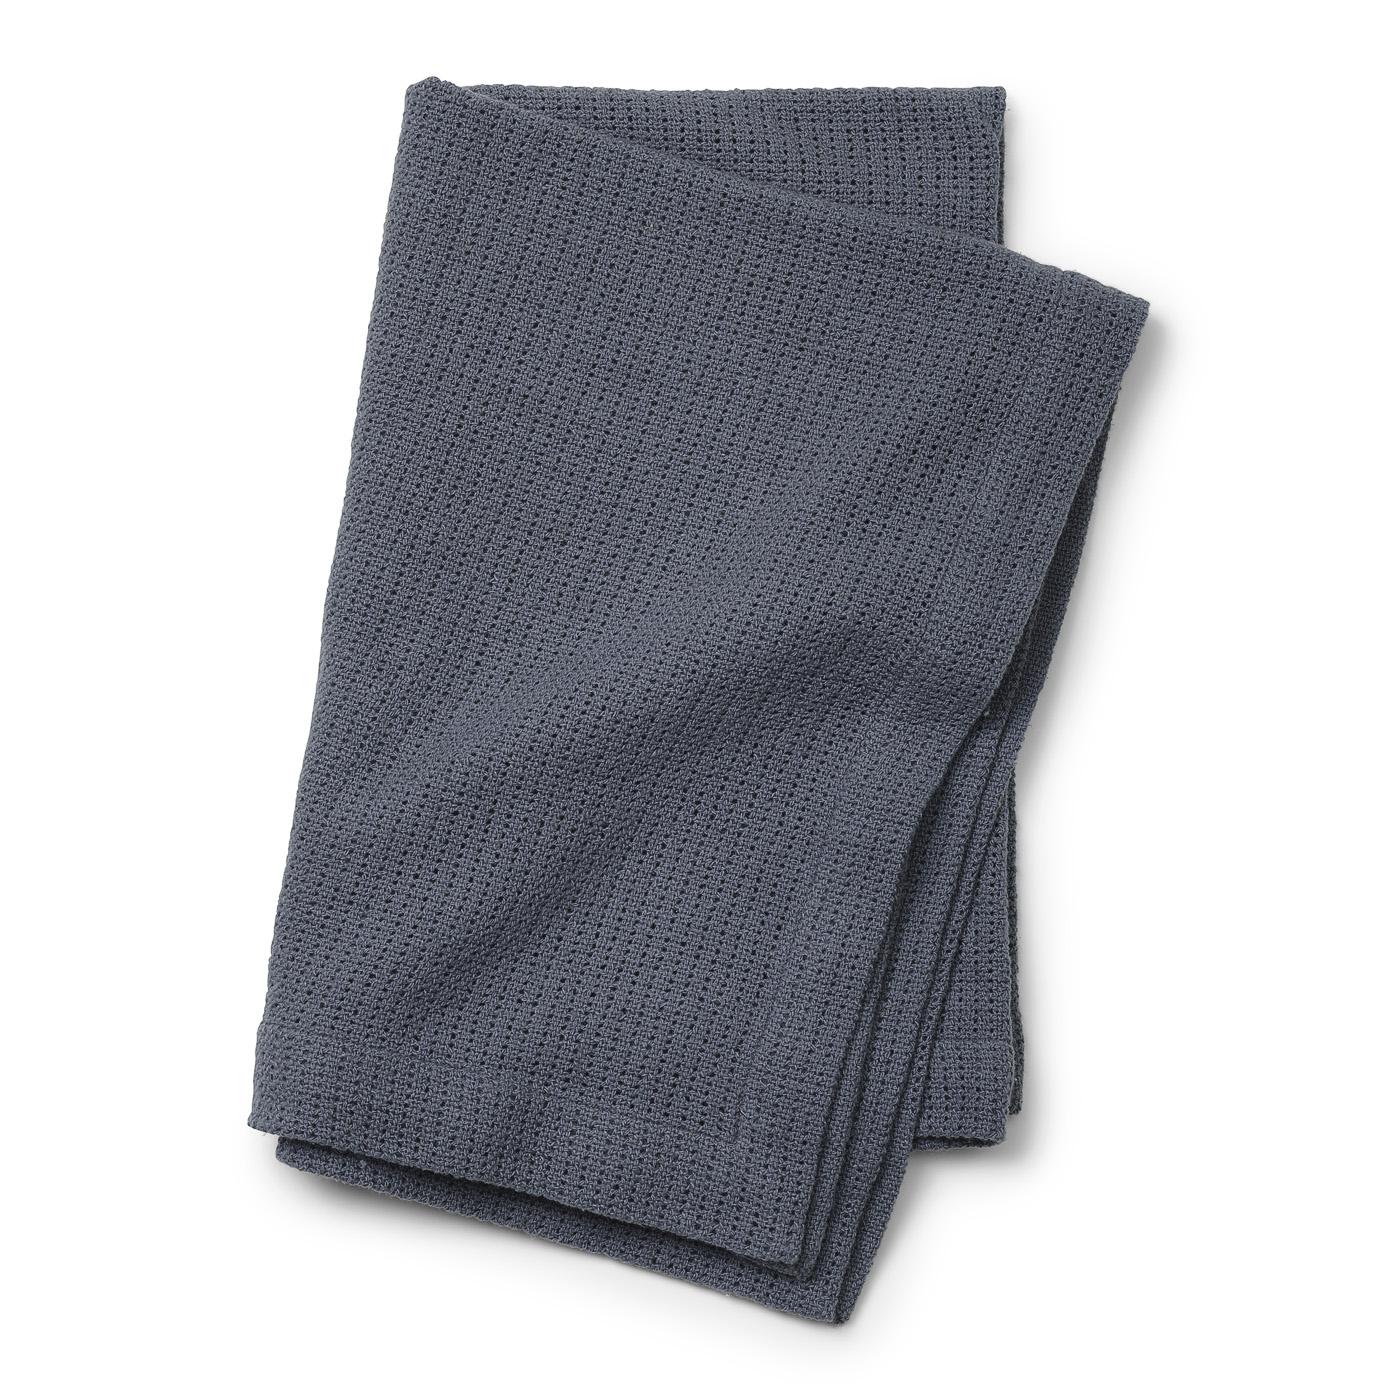 Cellular Blanket - Tender Blue